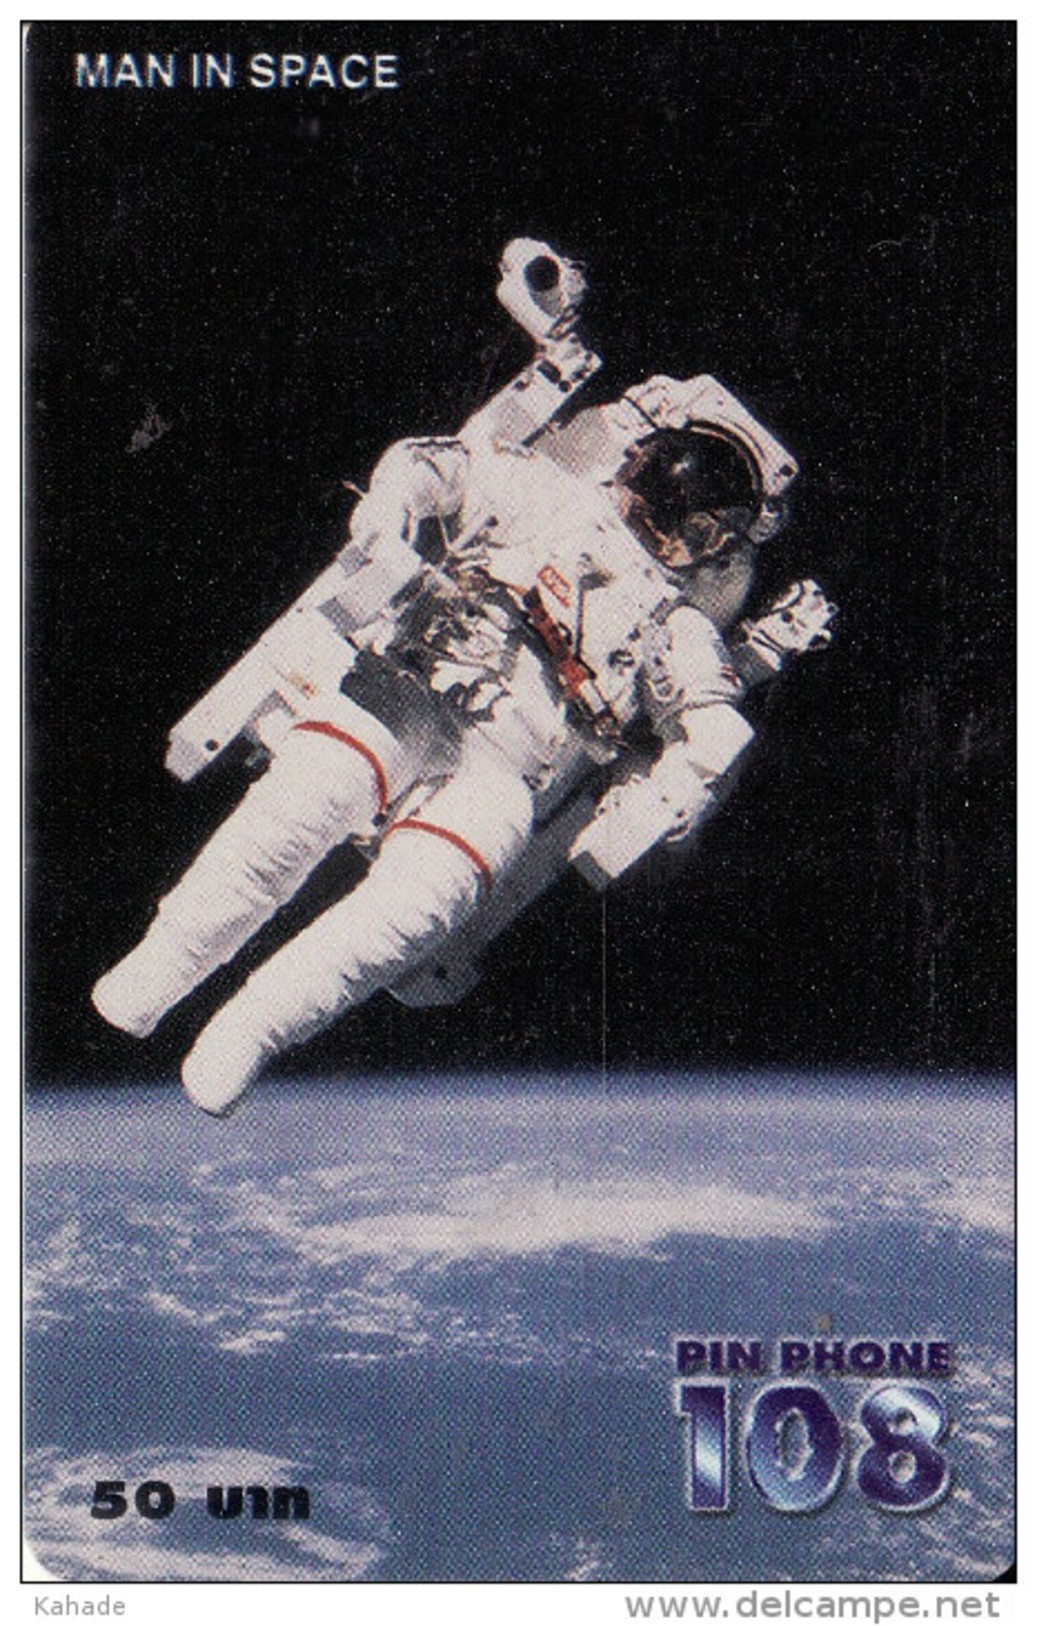 Thailand Pin Phone 108 Phonecard Man In Space Kat.244 - Thaïland